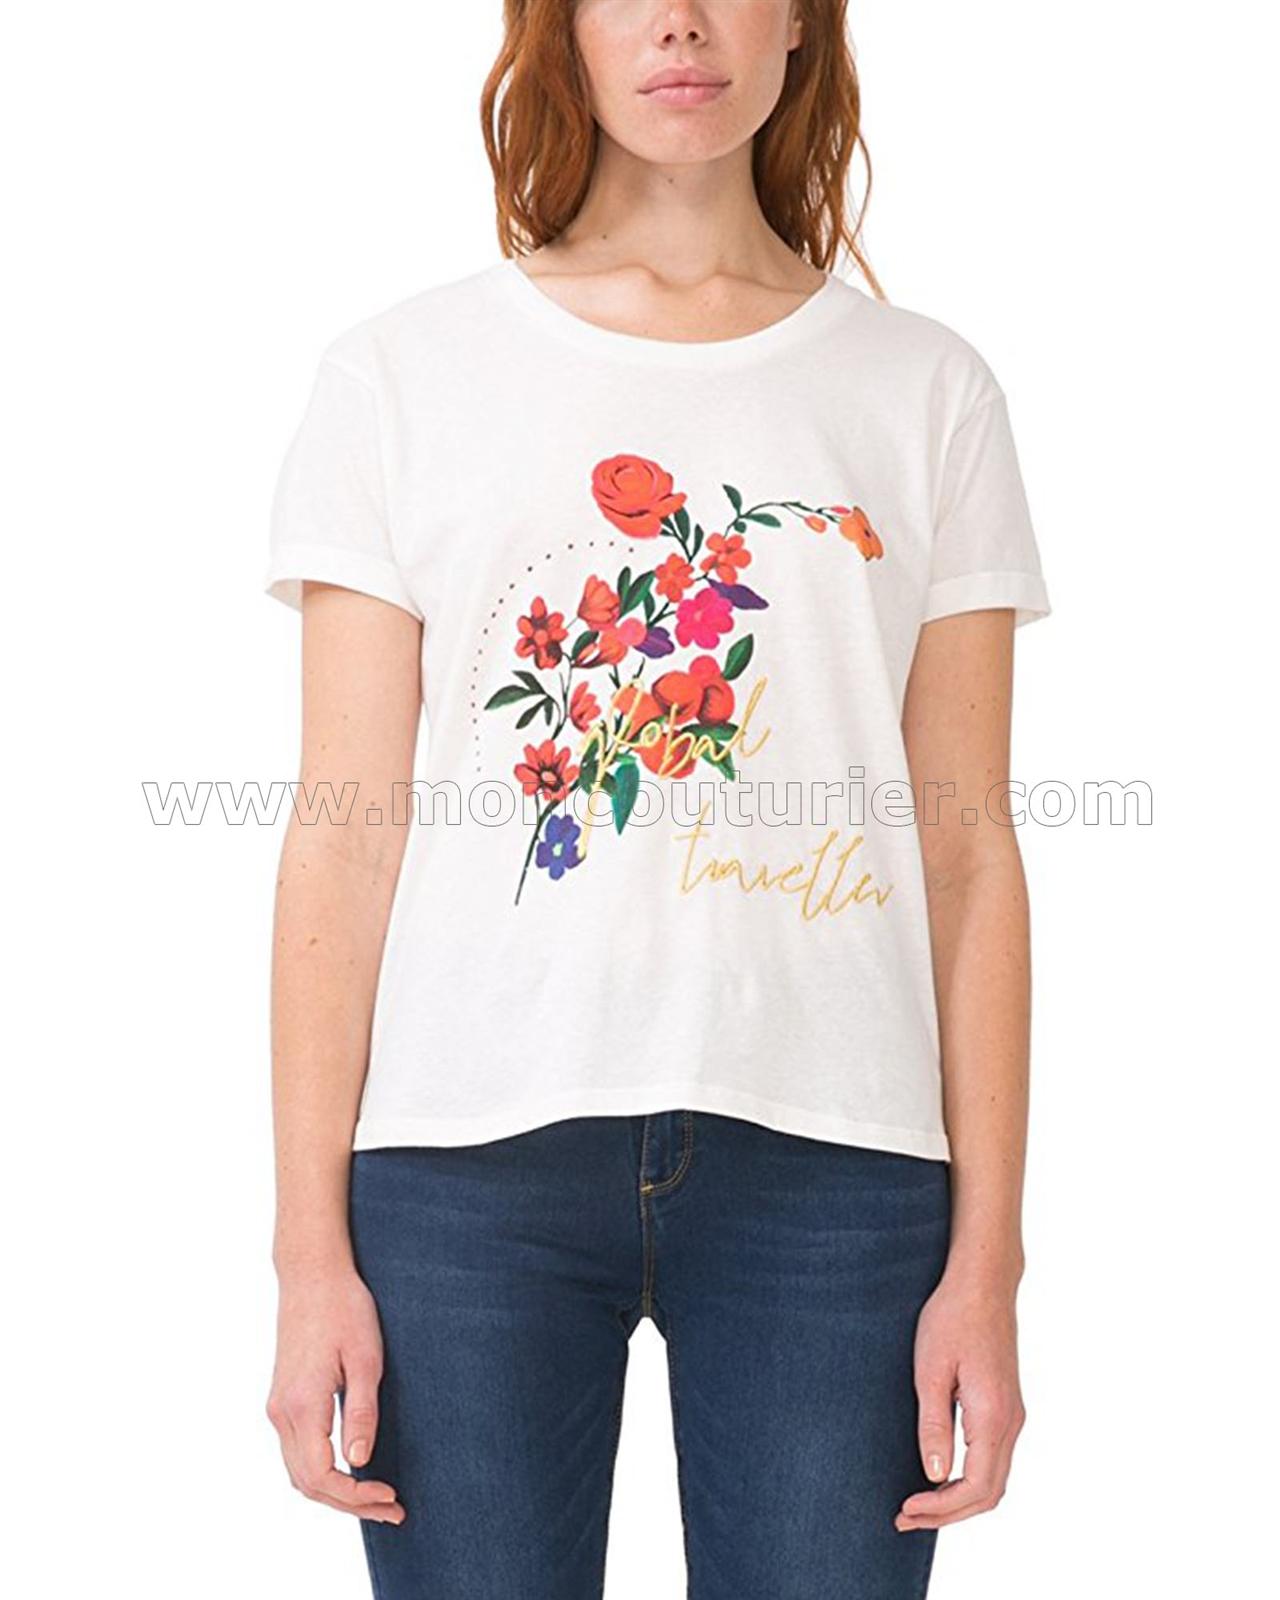 desigual women 39 s t shirt marina. Black Bedroom Furniture Sets. Home Design Ideas